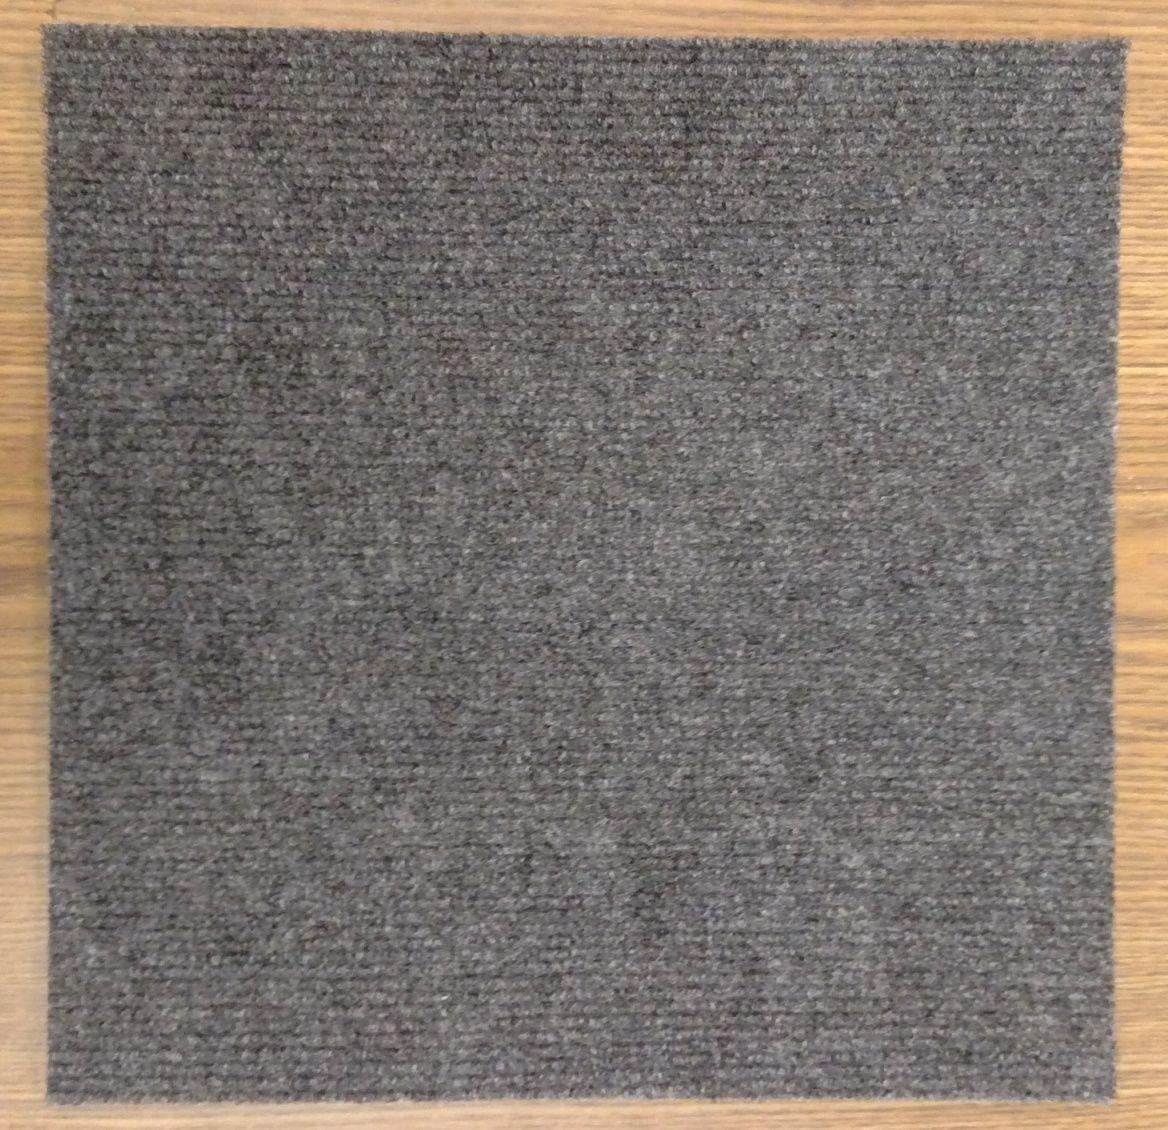 Peel and Stick Carpet Tiles Charcoal 36 Square feet Flooring